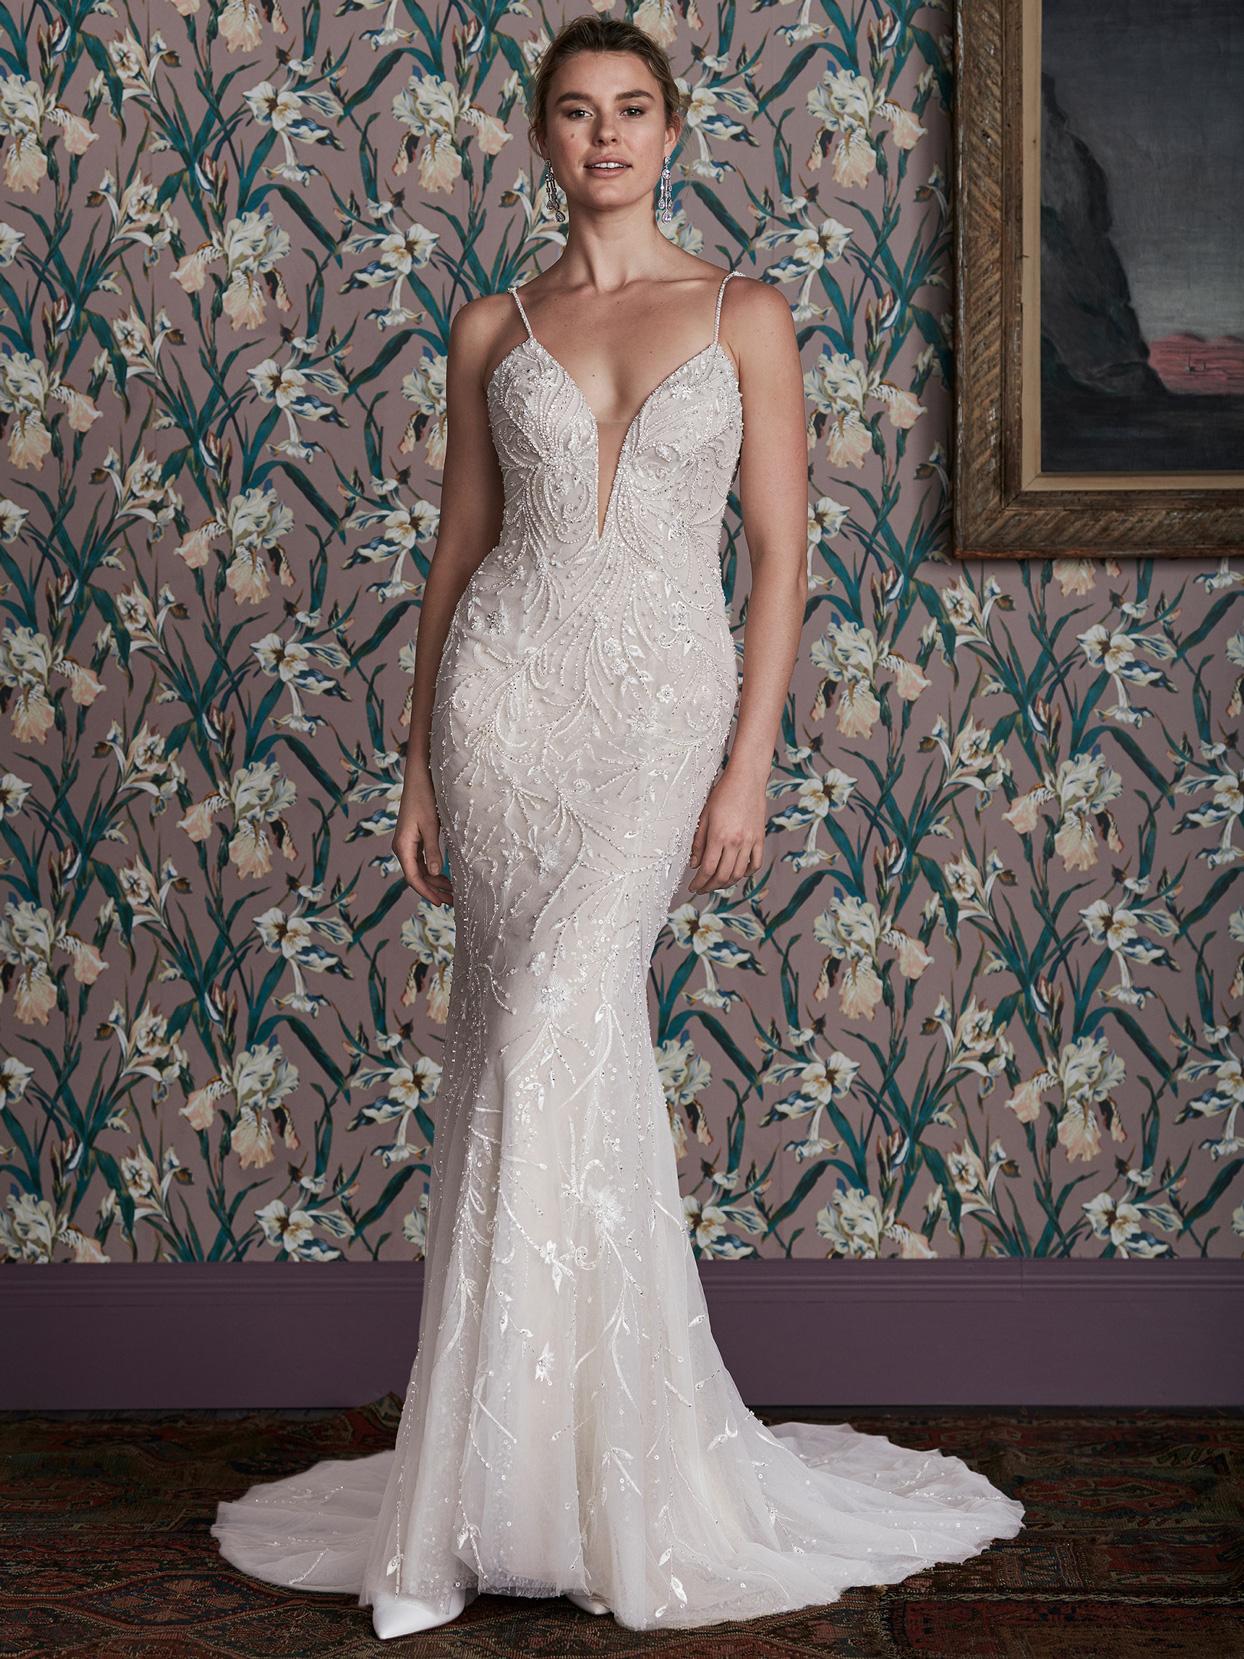 justin alexander plunging v-neck thin strap fitted wedding dress spring 2021